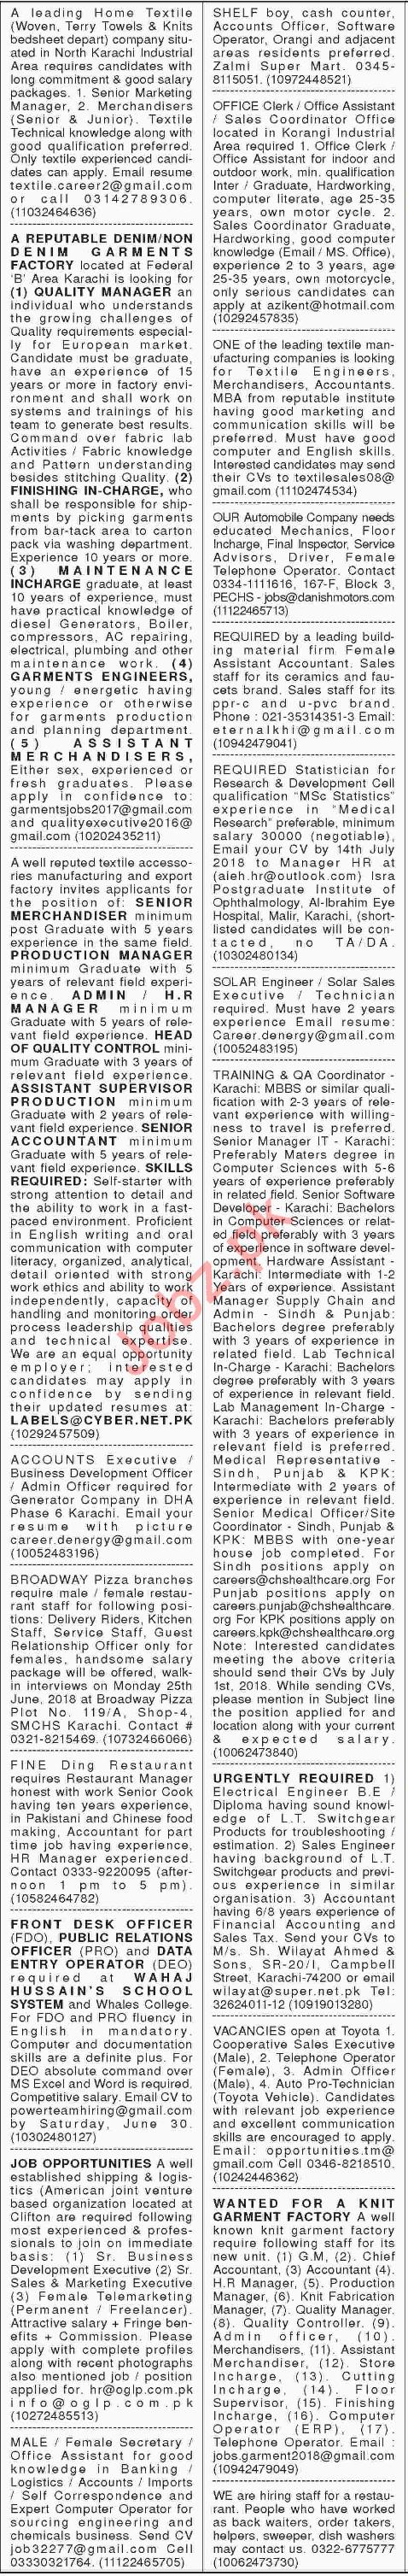 Daily Dawn Newspaper Classified Ads 2018